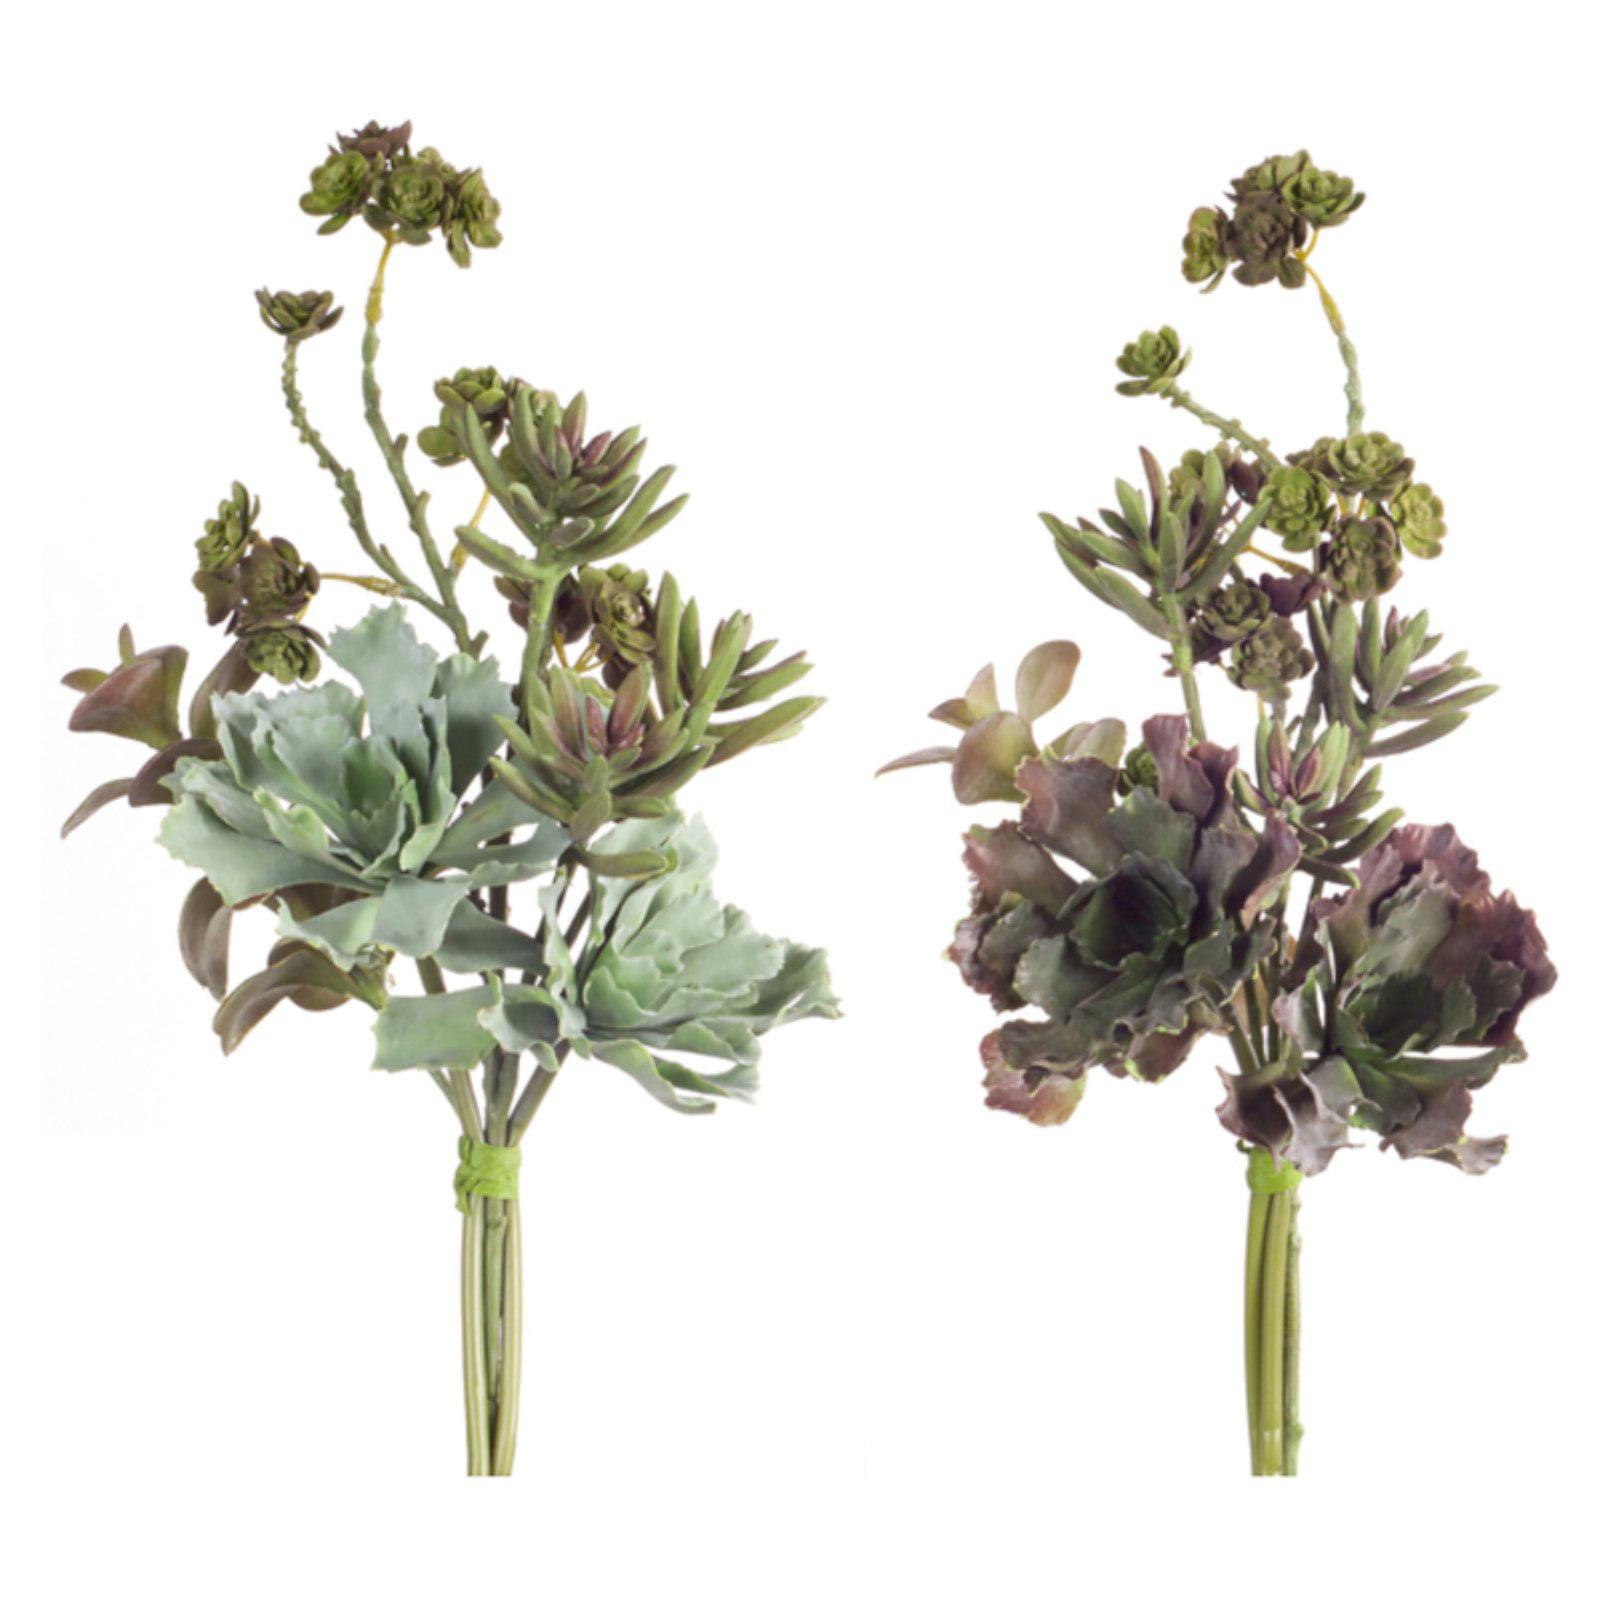 Melrose International Succulent Bundle Silk Plant - Set of 6